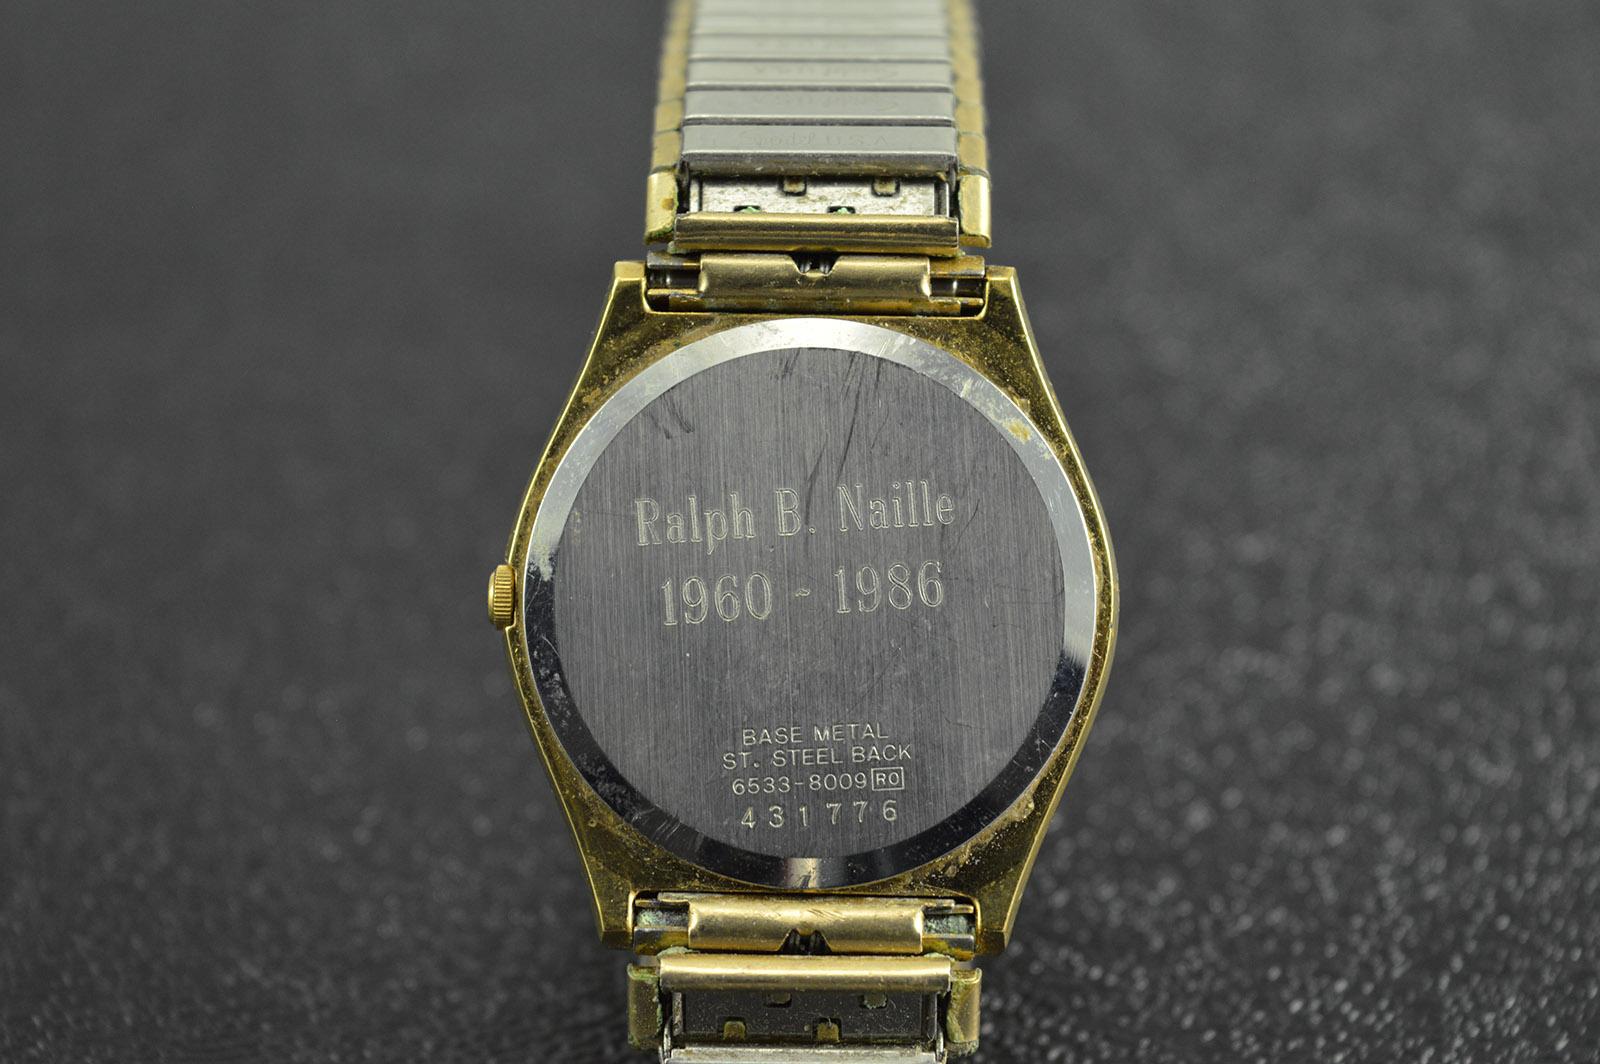 seiko quartz gold plated brushed finish round 283mm face